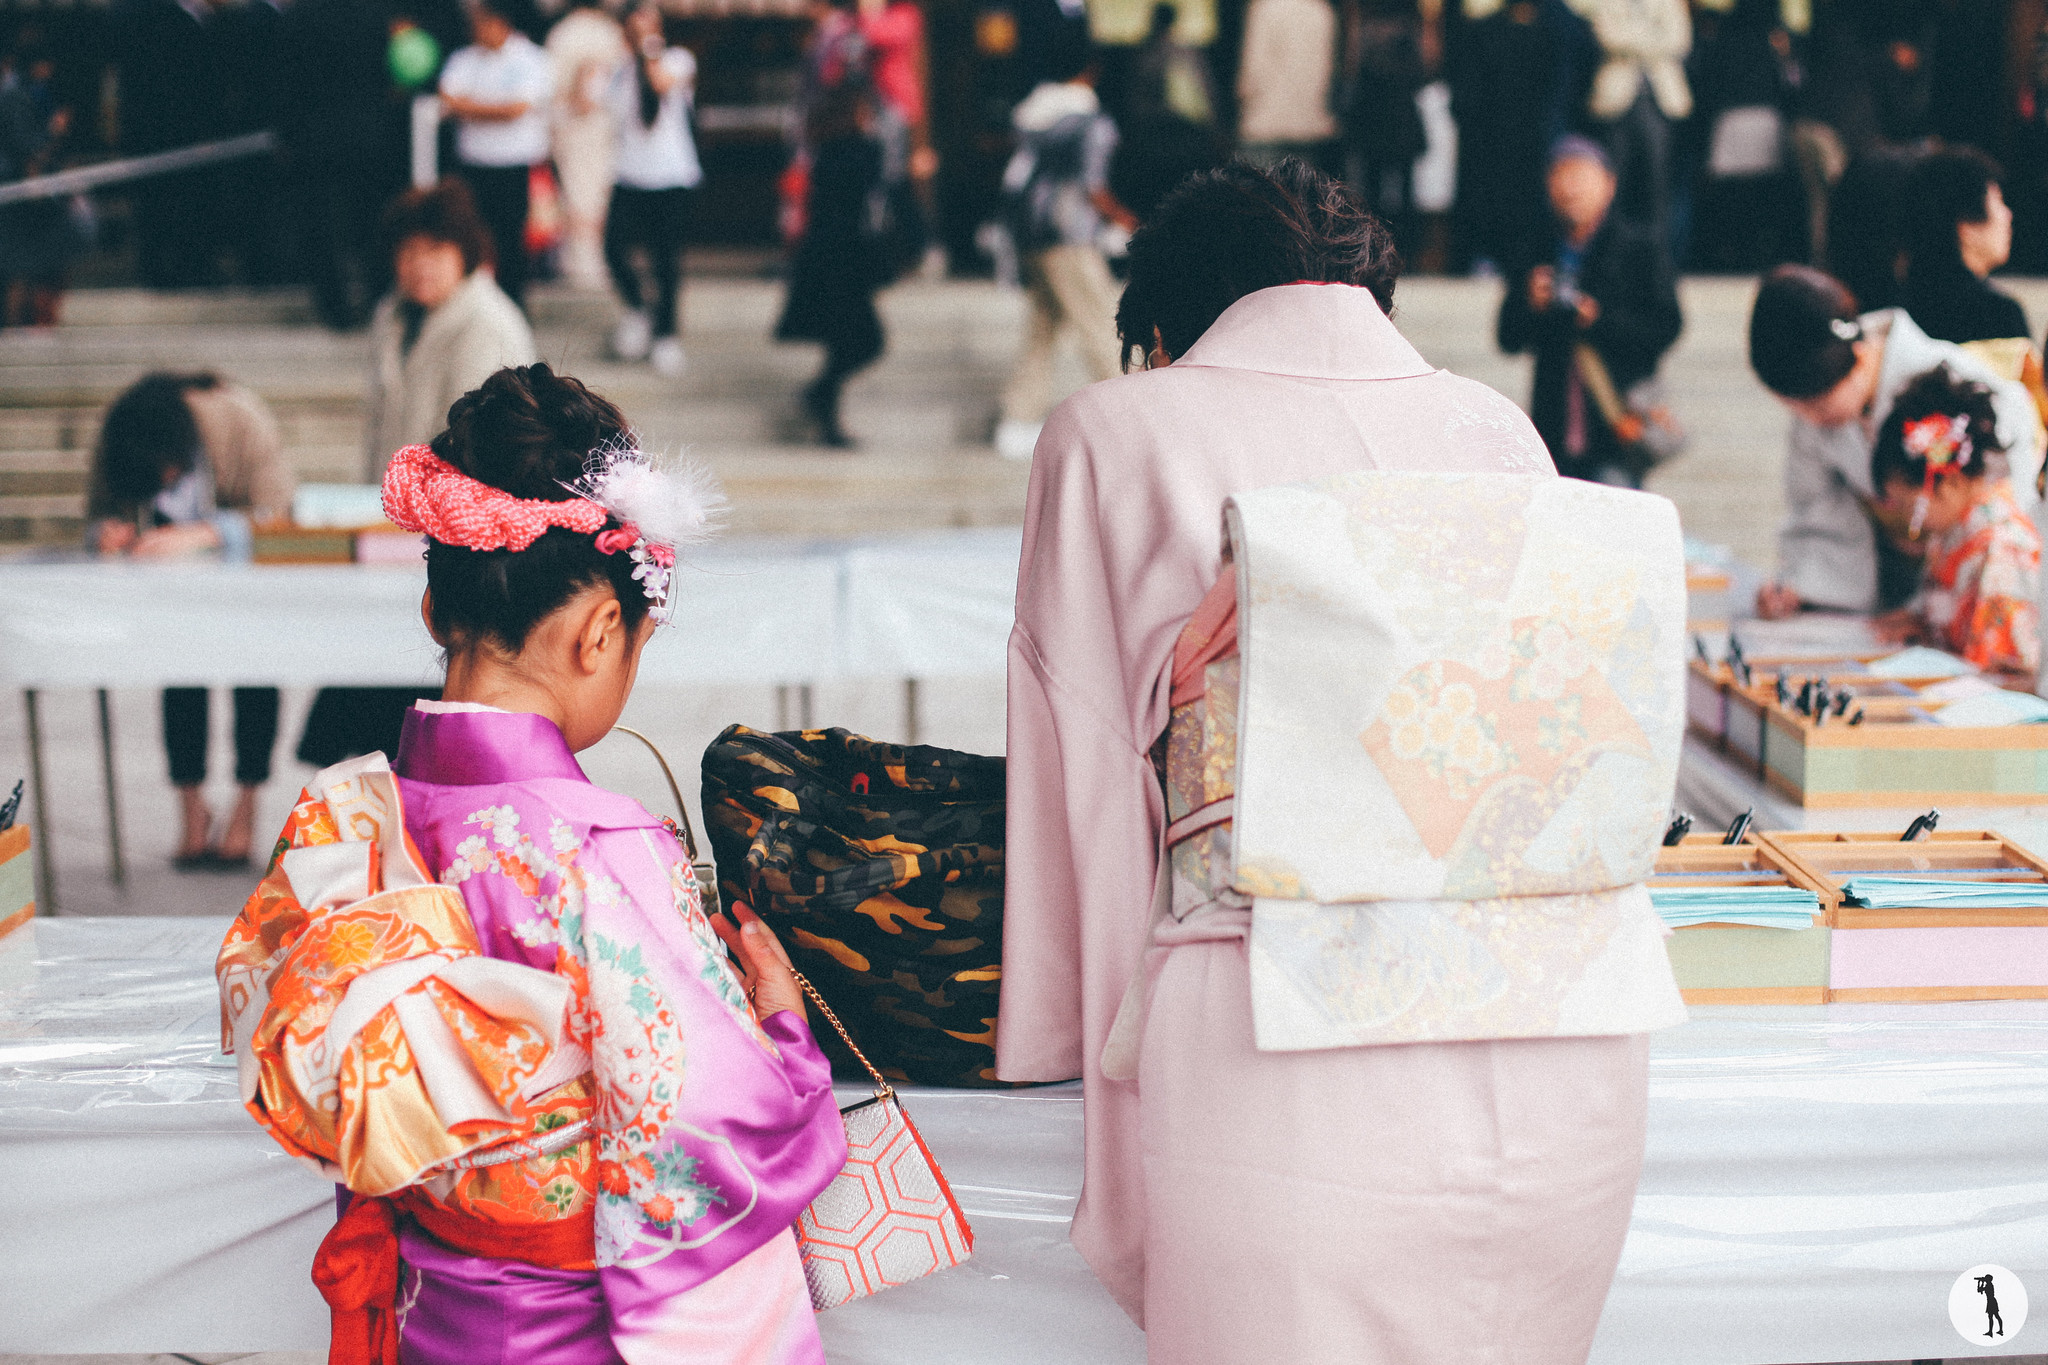 JAPON, Meiji Shrine, Tokyo